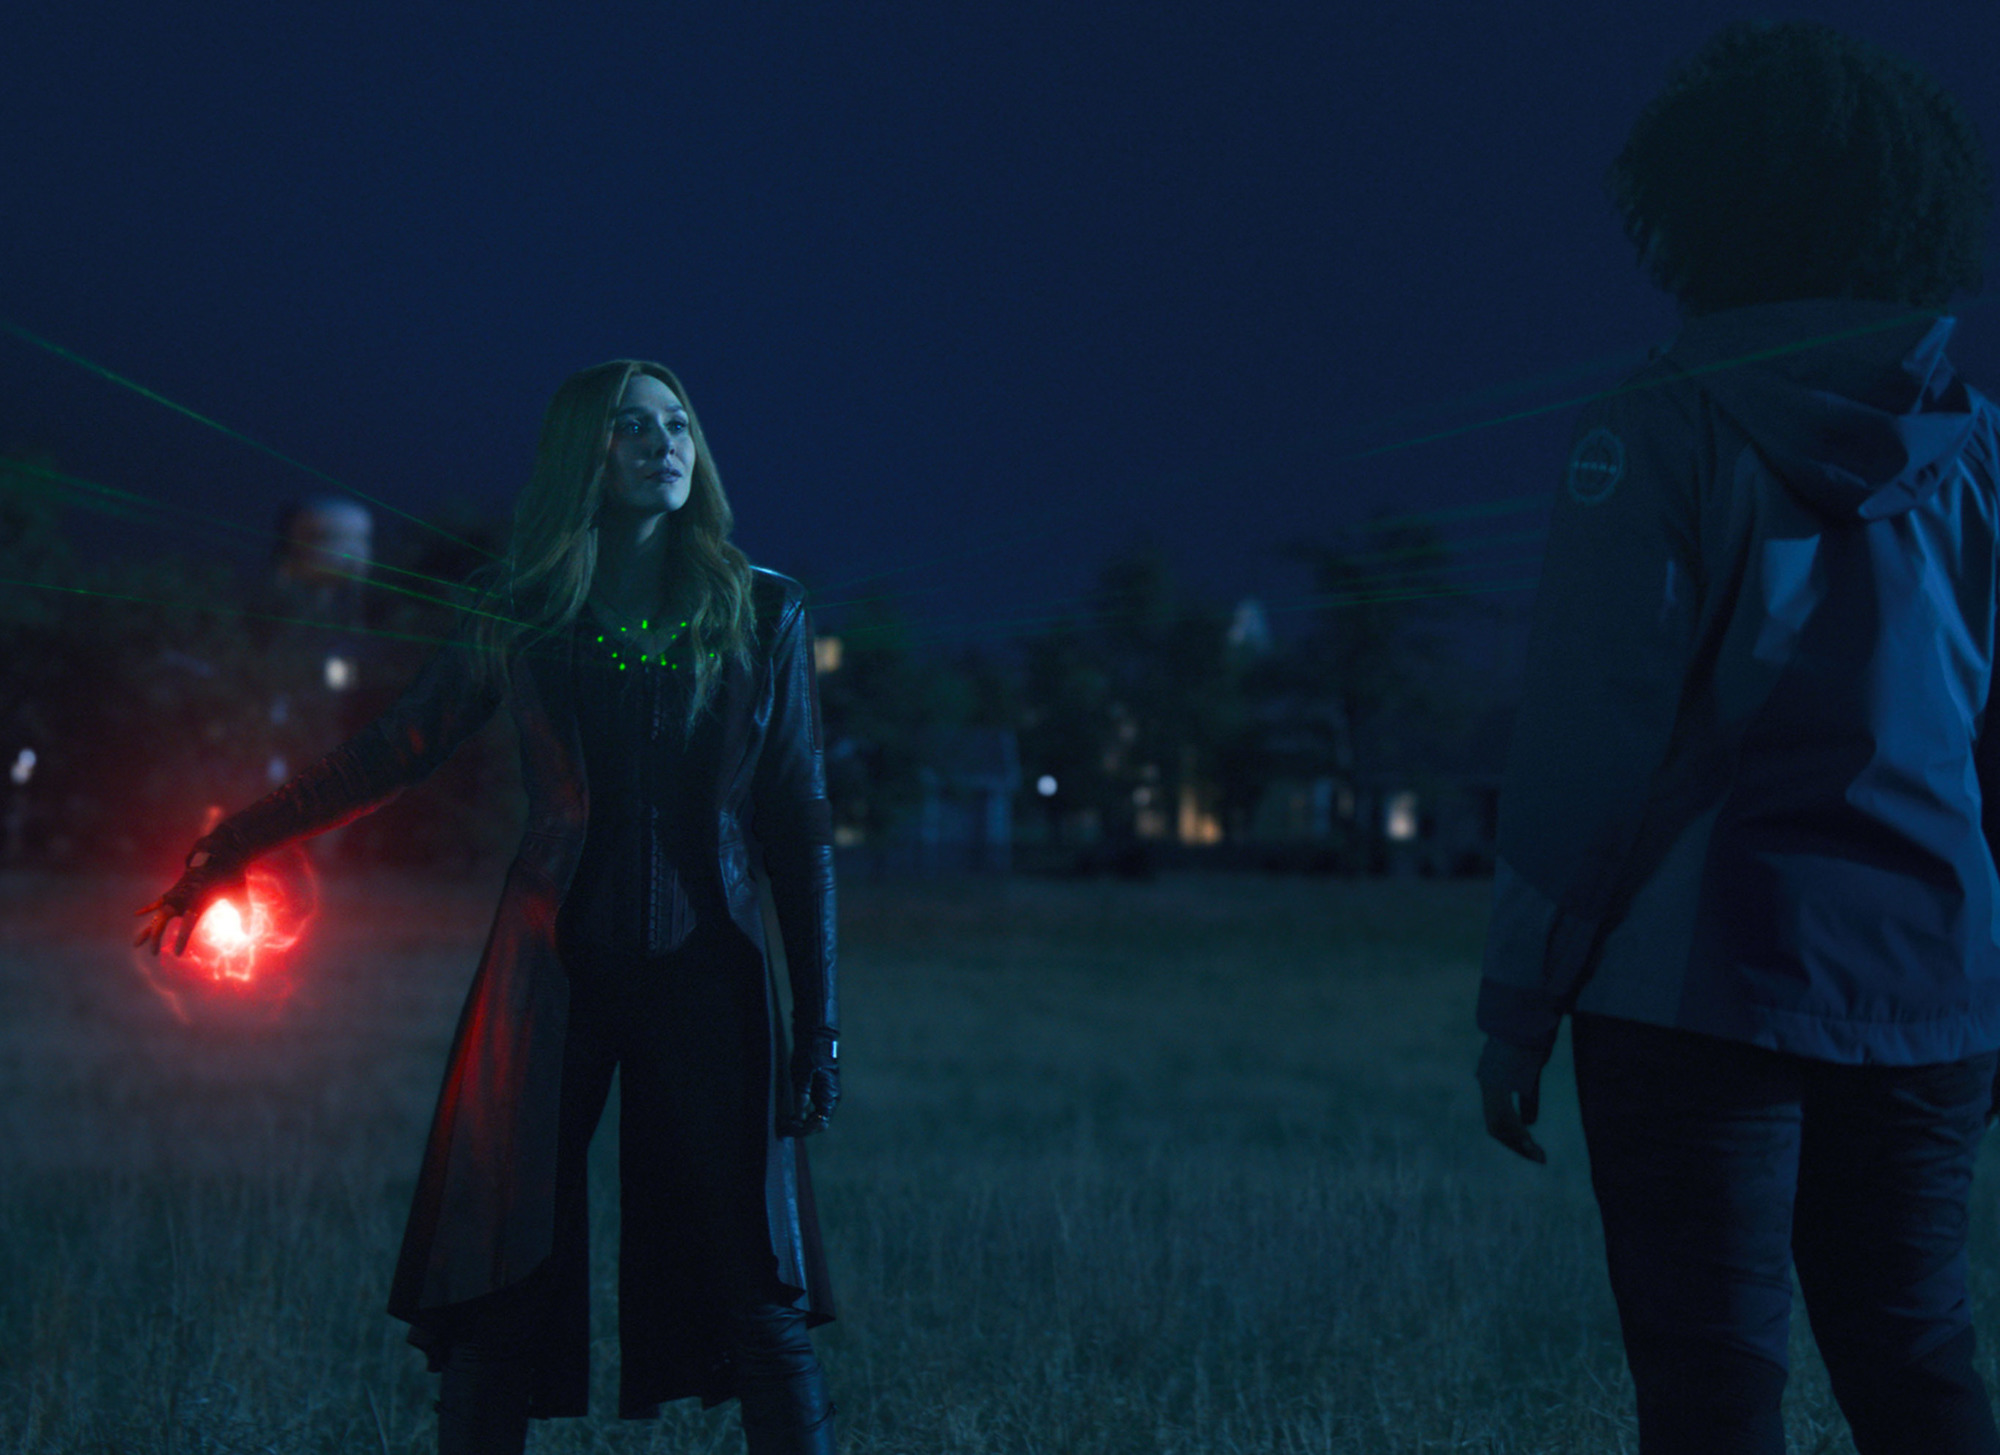 Olsen as Wanda in 'WandaVision' talking to Monica Rambeau (Teyonah Parris) and S.W.O.R.D.